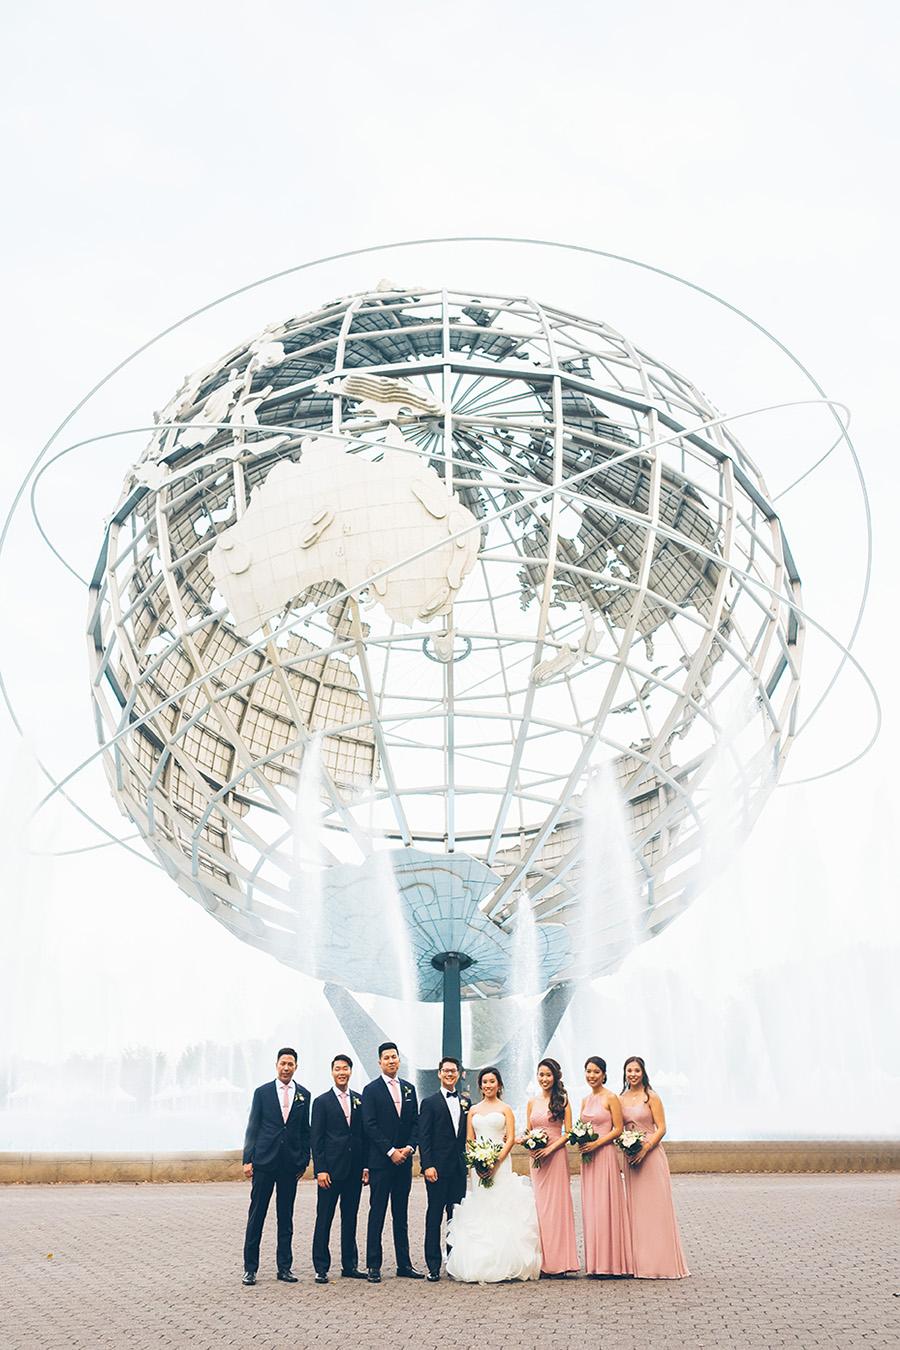 JUDITH-IRVING-NYC-WEDDING-BRIDALPARTY-CYNTHIACHUNG-0243.jpg